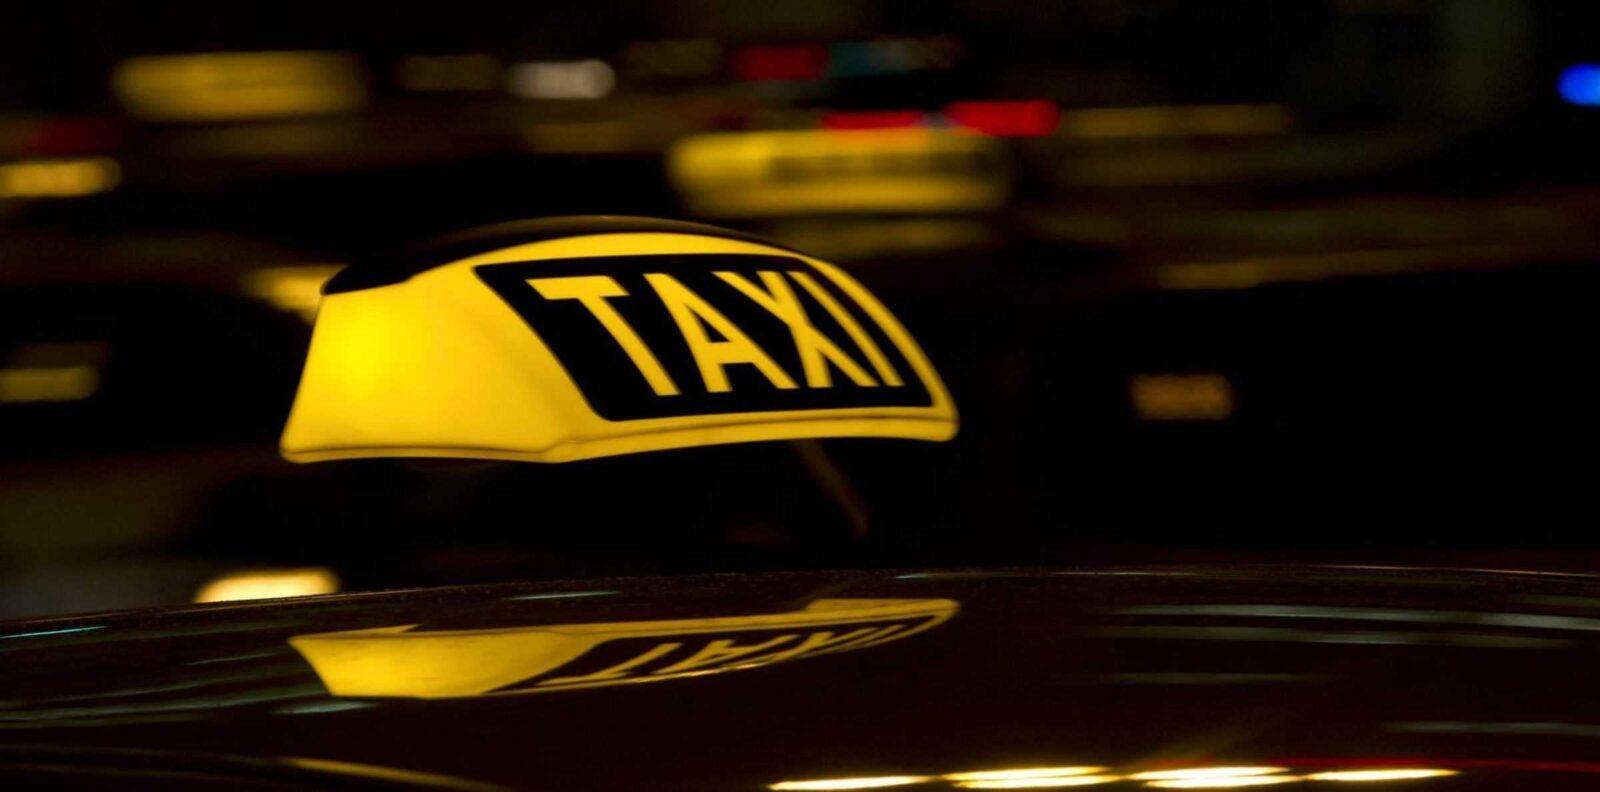 DFW Taxi Taxi Dallas Fort Worth Cab